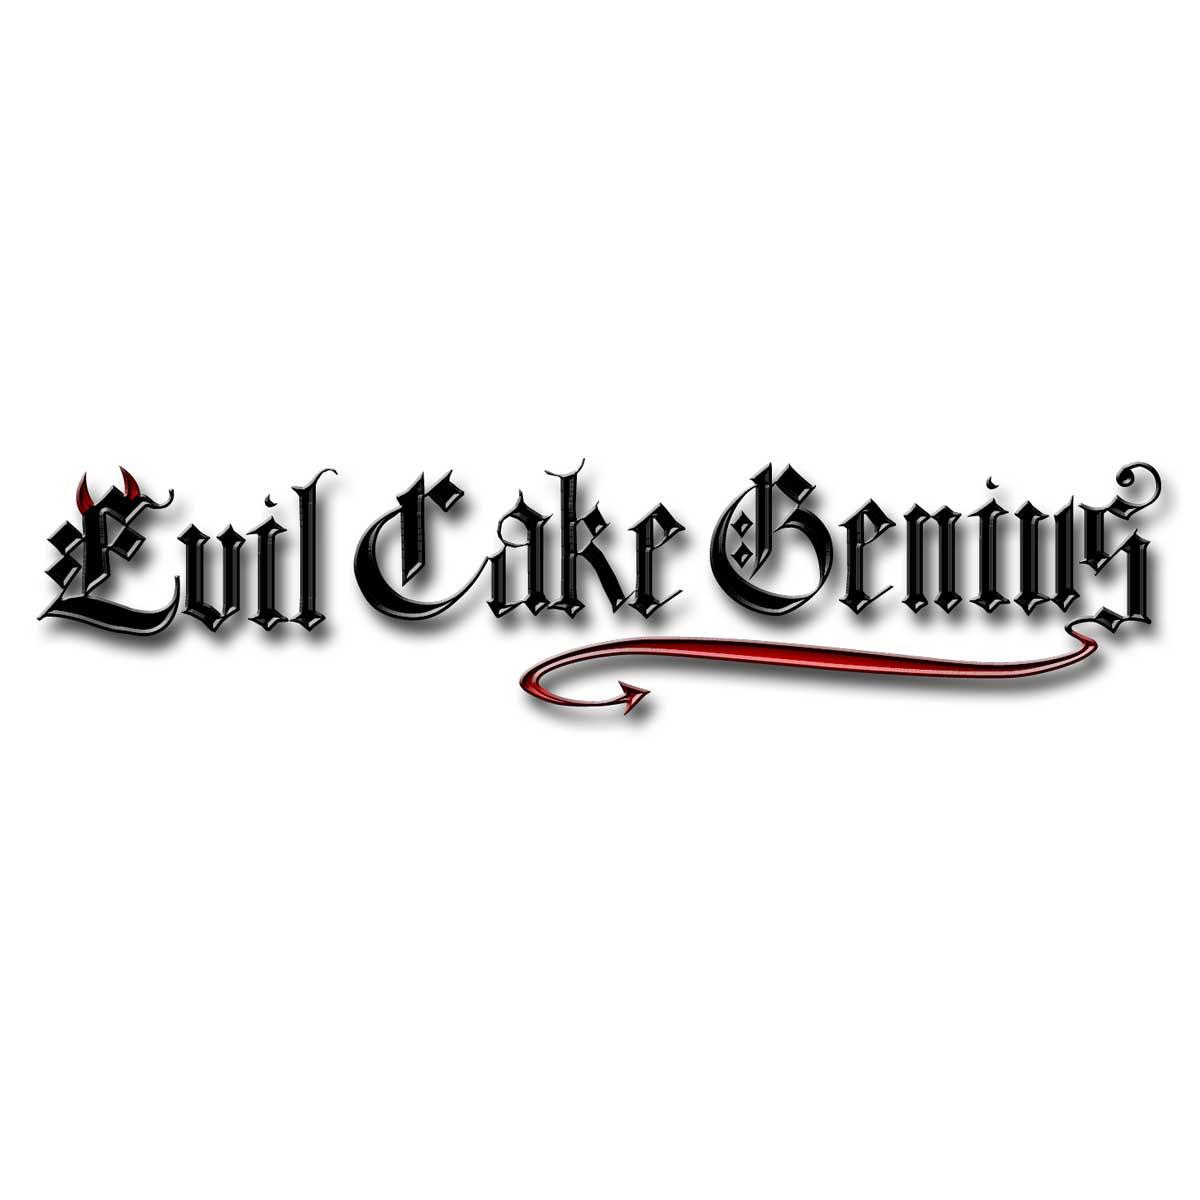 evil cake genius christmas cookies